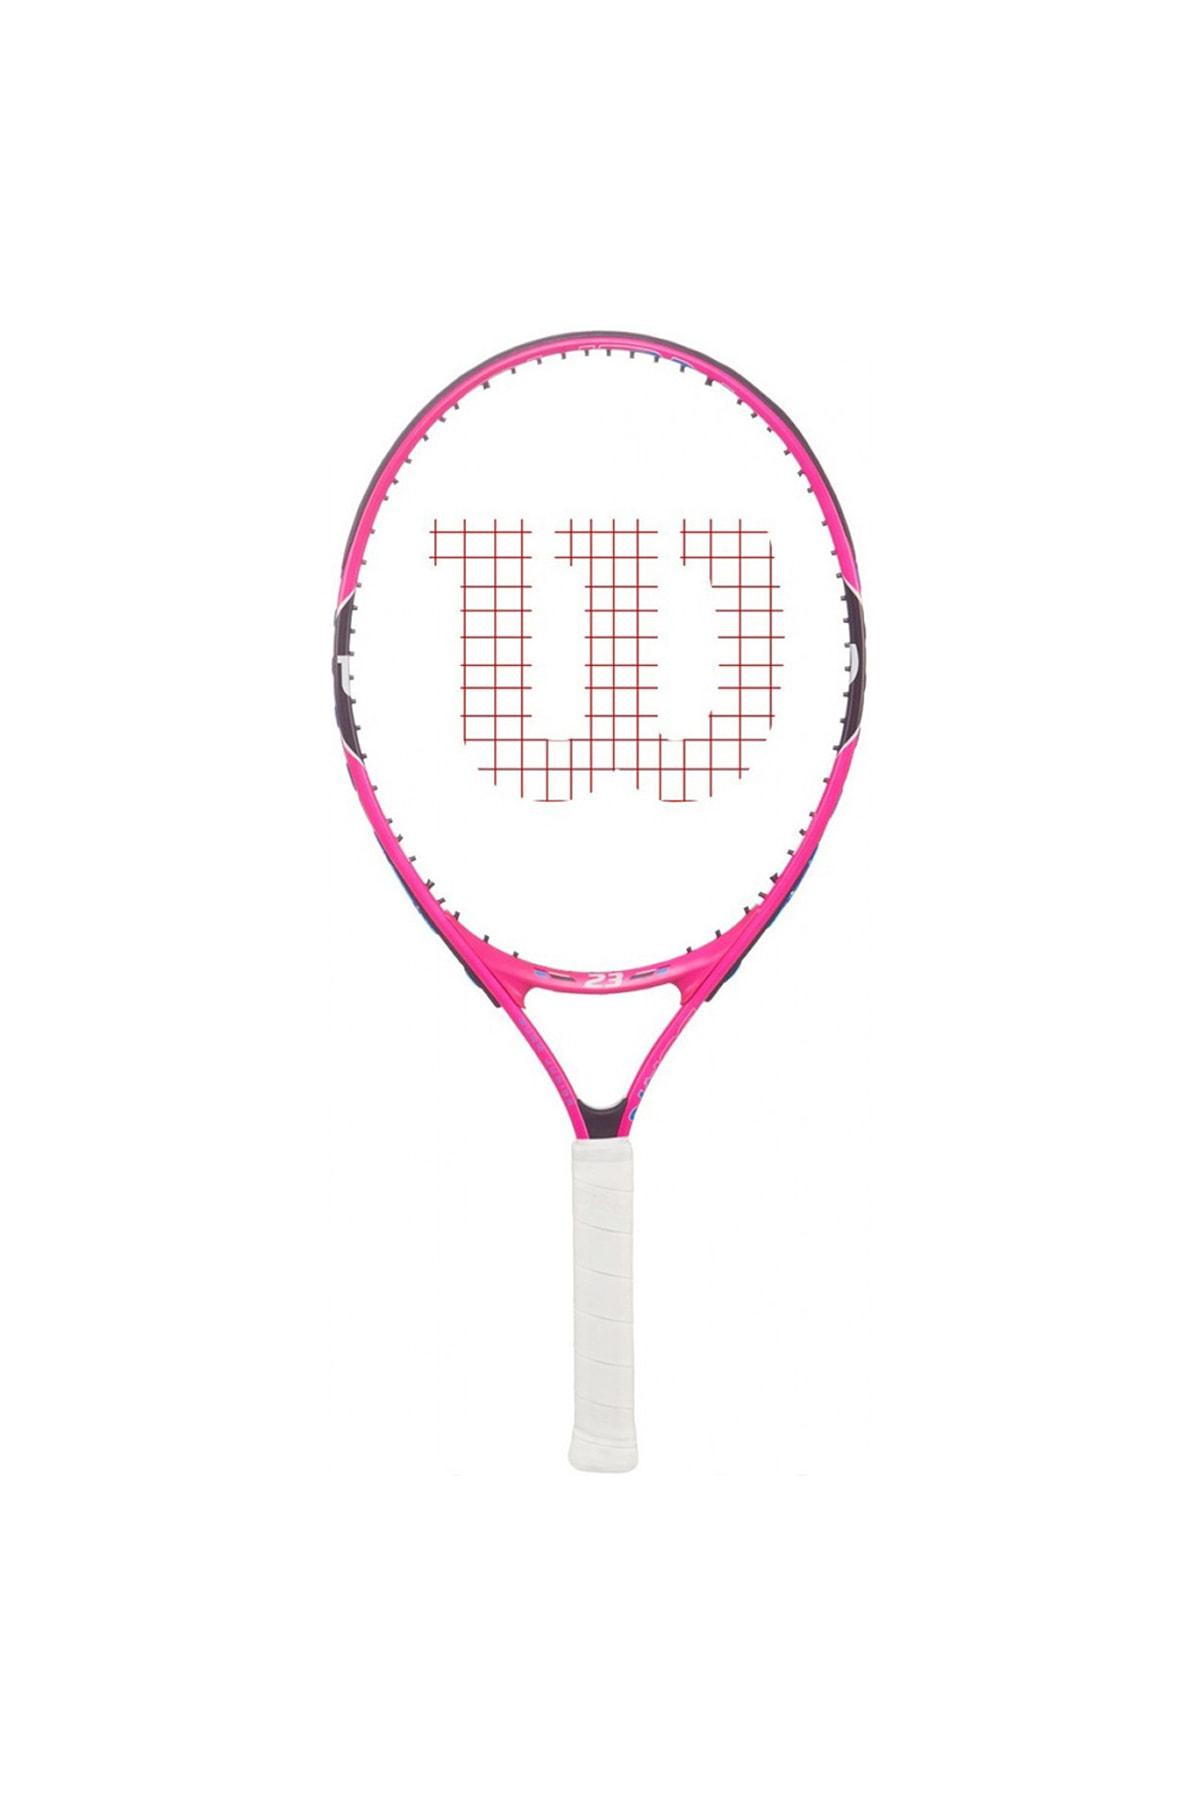 Tenis Raketi Burn Pink 23 Genç (WRT218100)